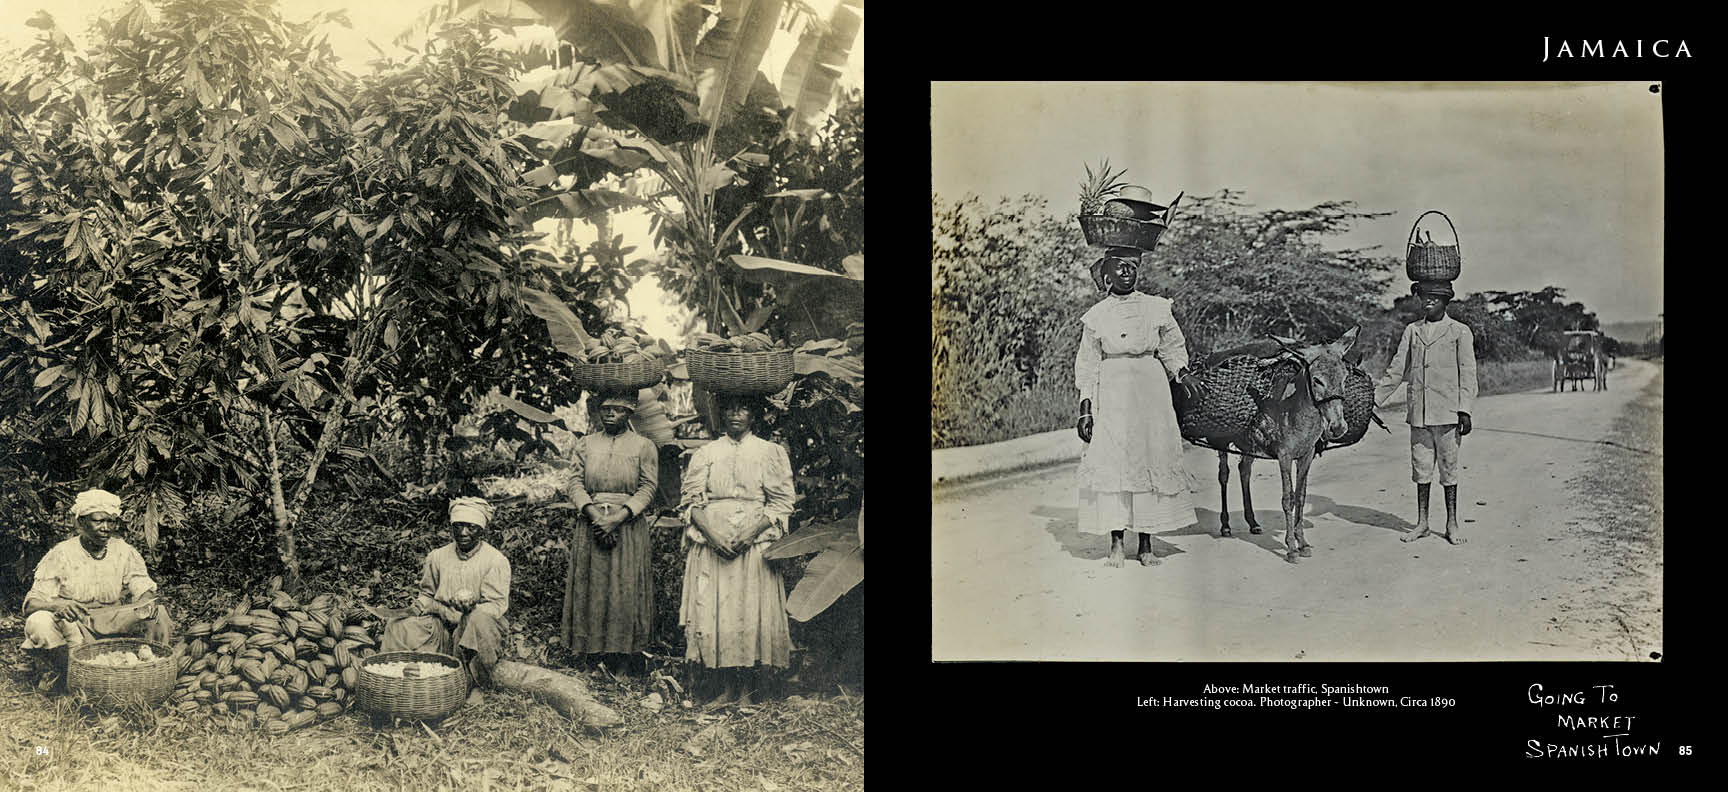 Circa West Indies_Jamaica.jpg